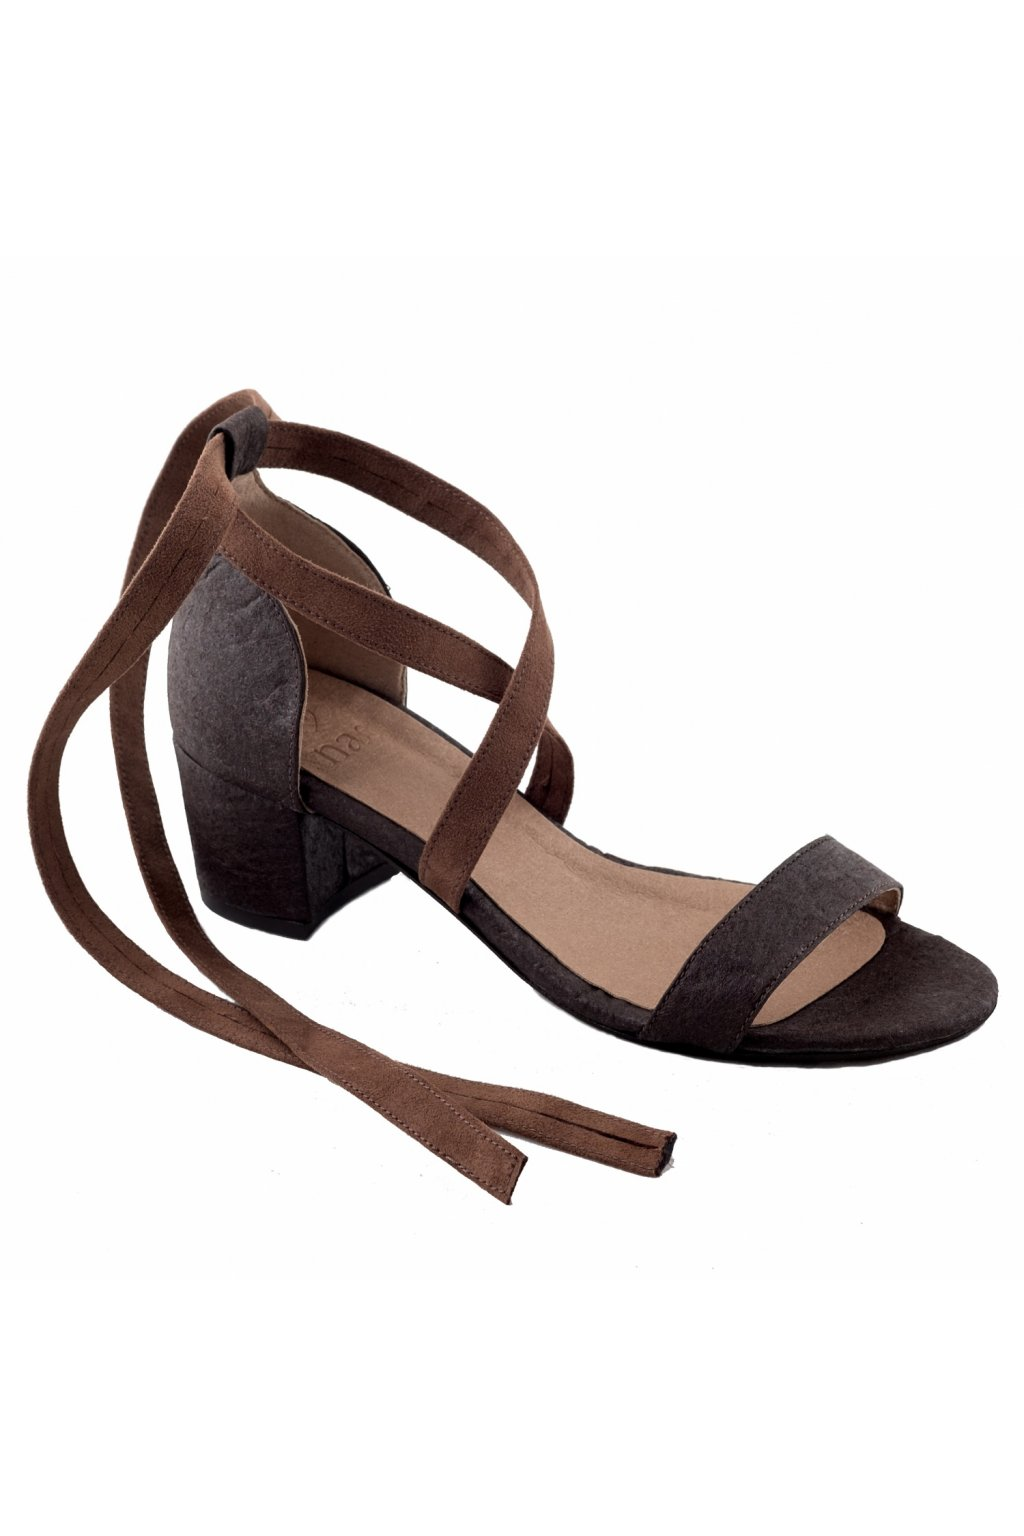 "Hnedé sandálky z ananásových vlákien ""Clau brown"""